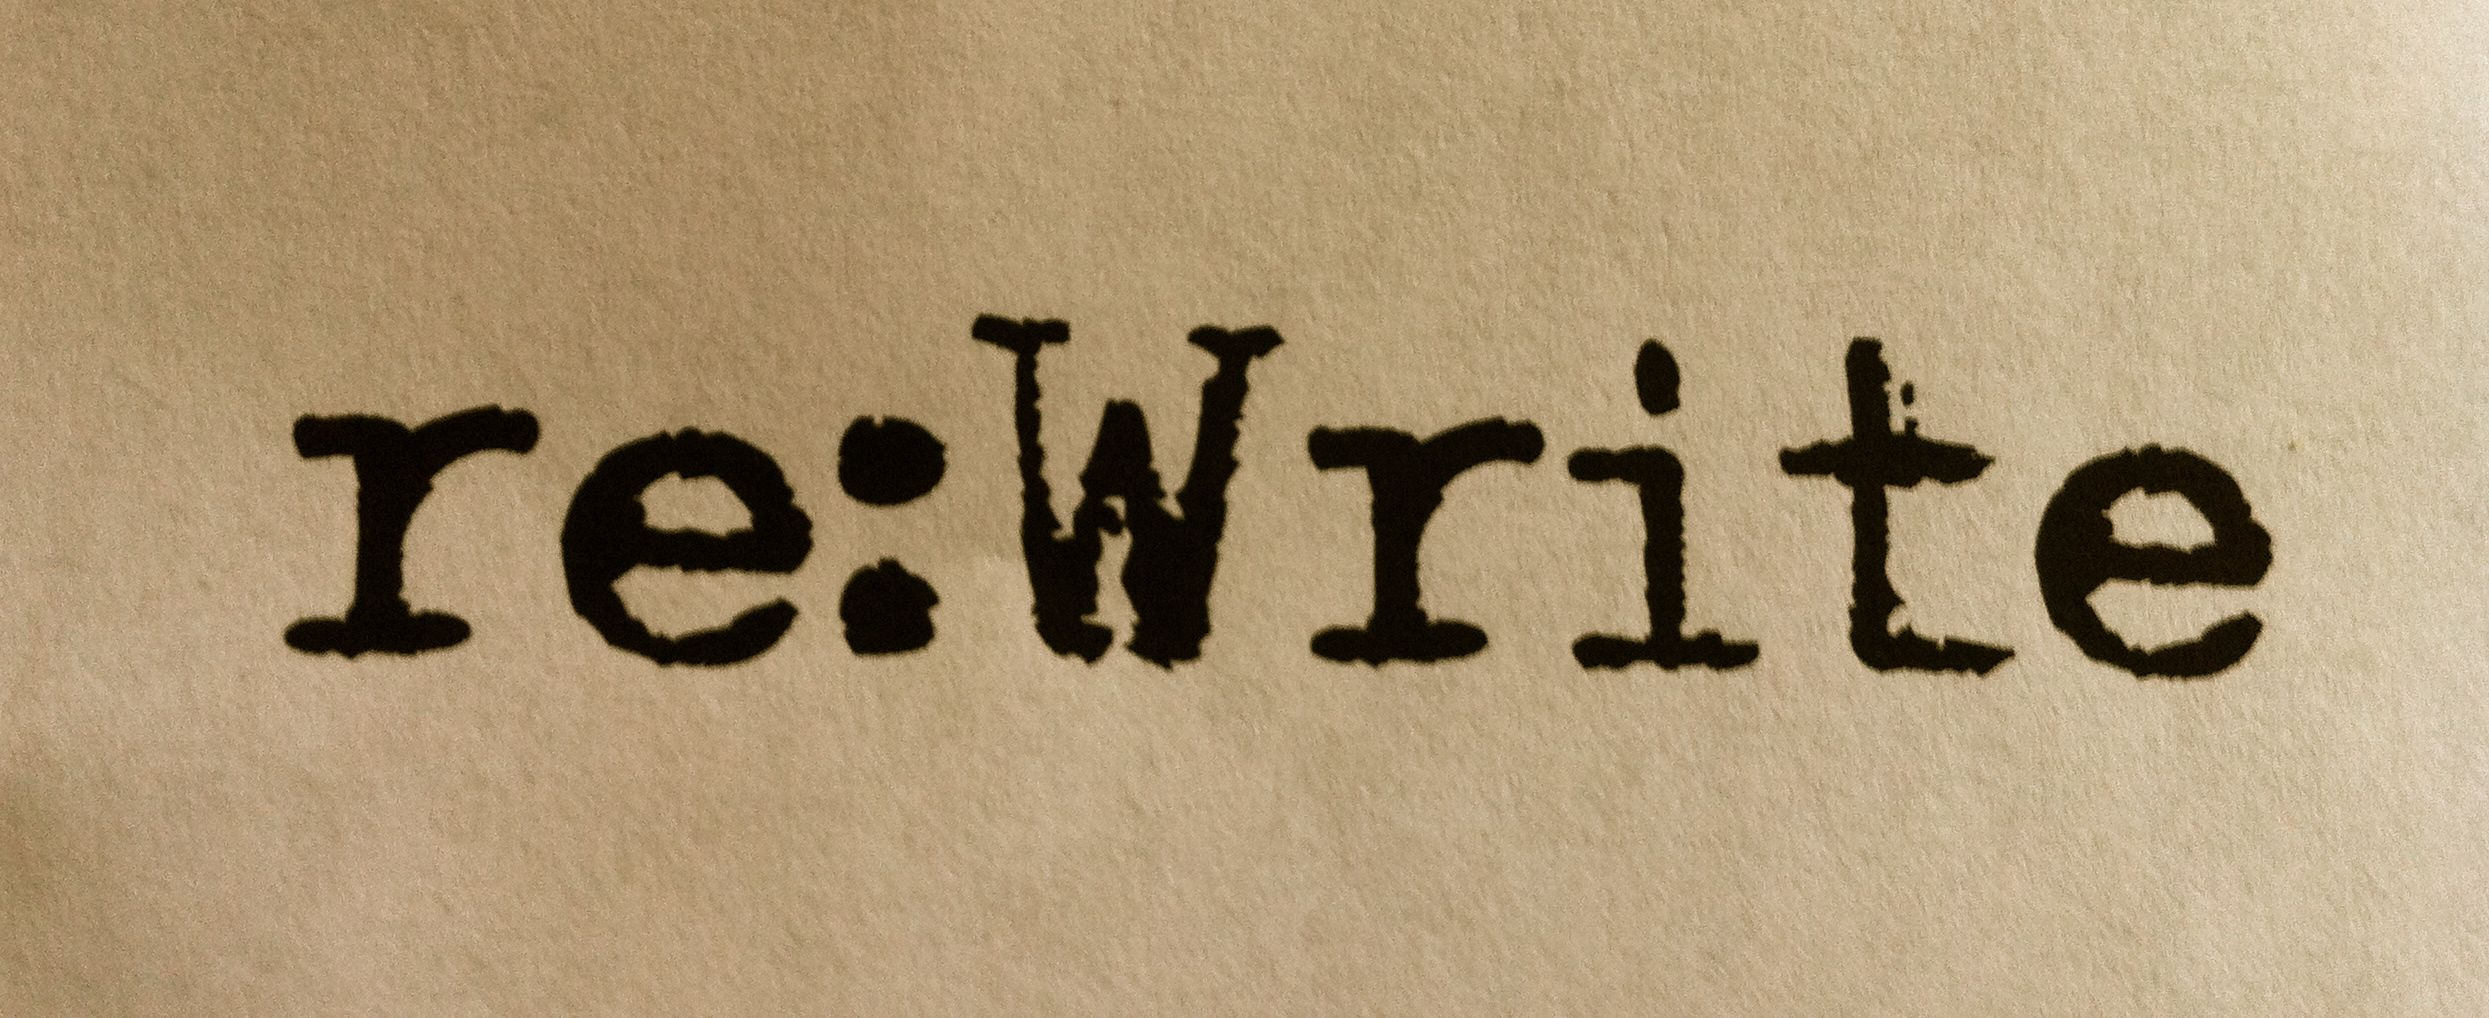 Get me rewrite!